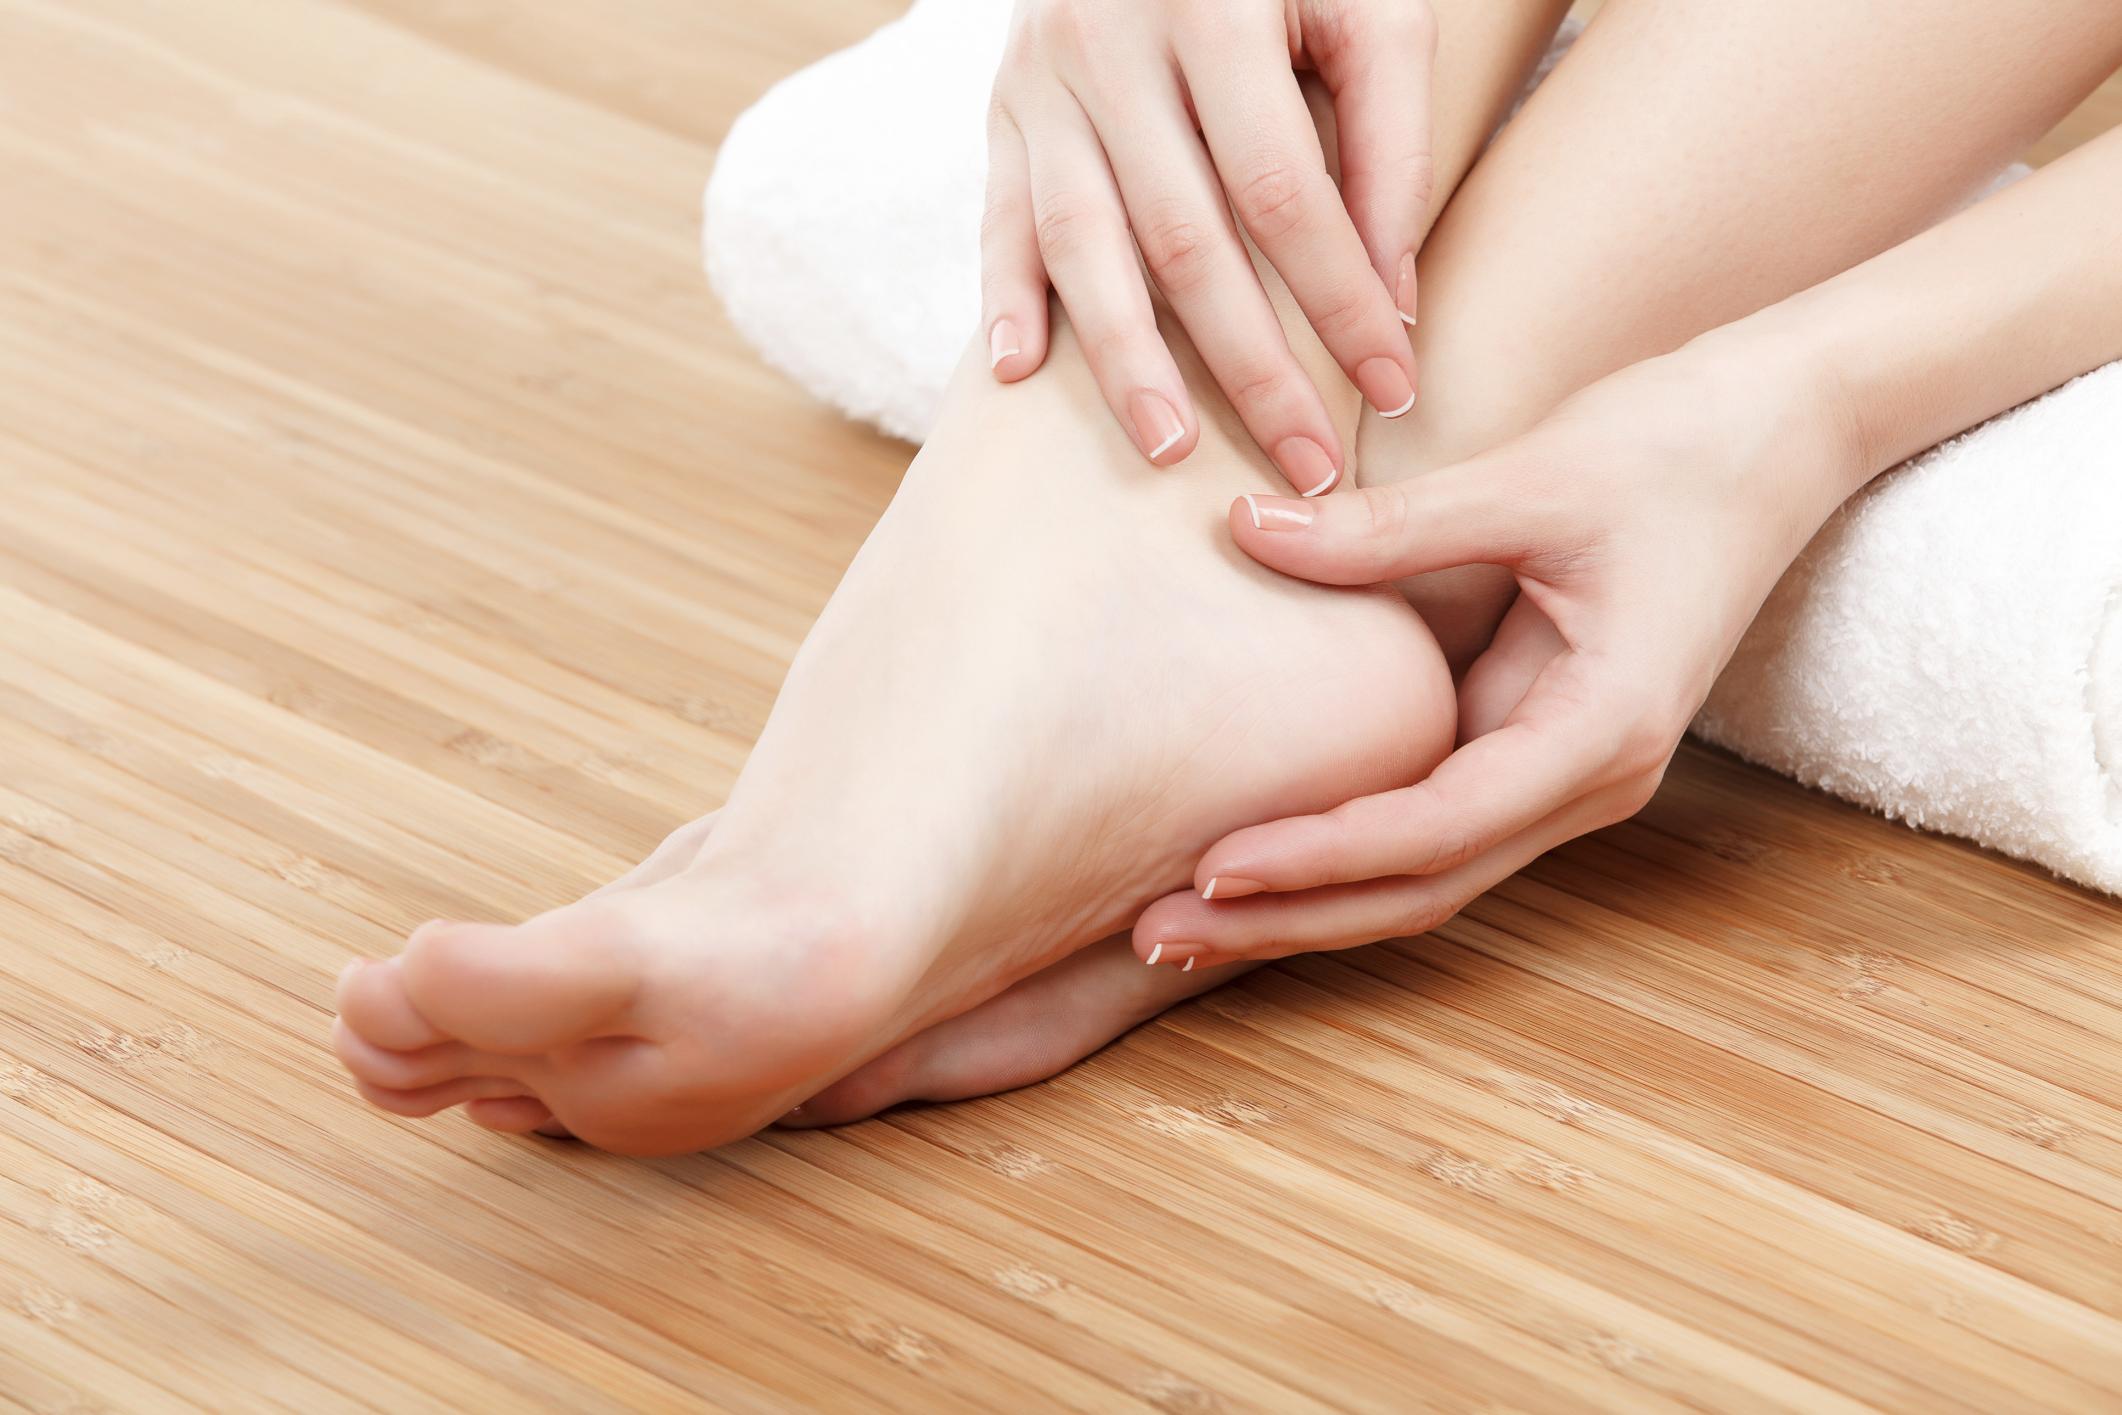 Jojoba-oil-uses-as-foot-softener